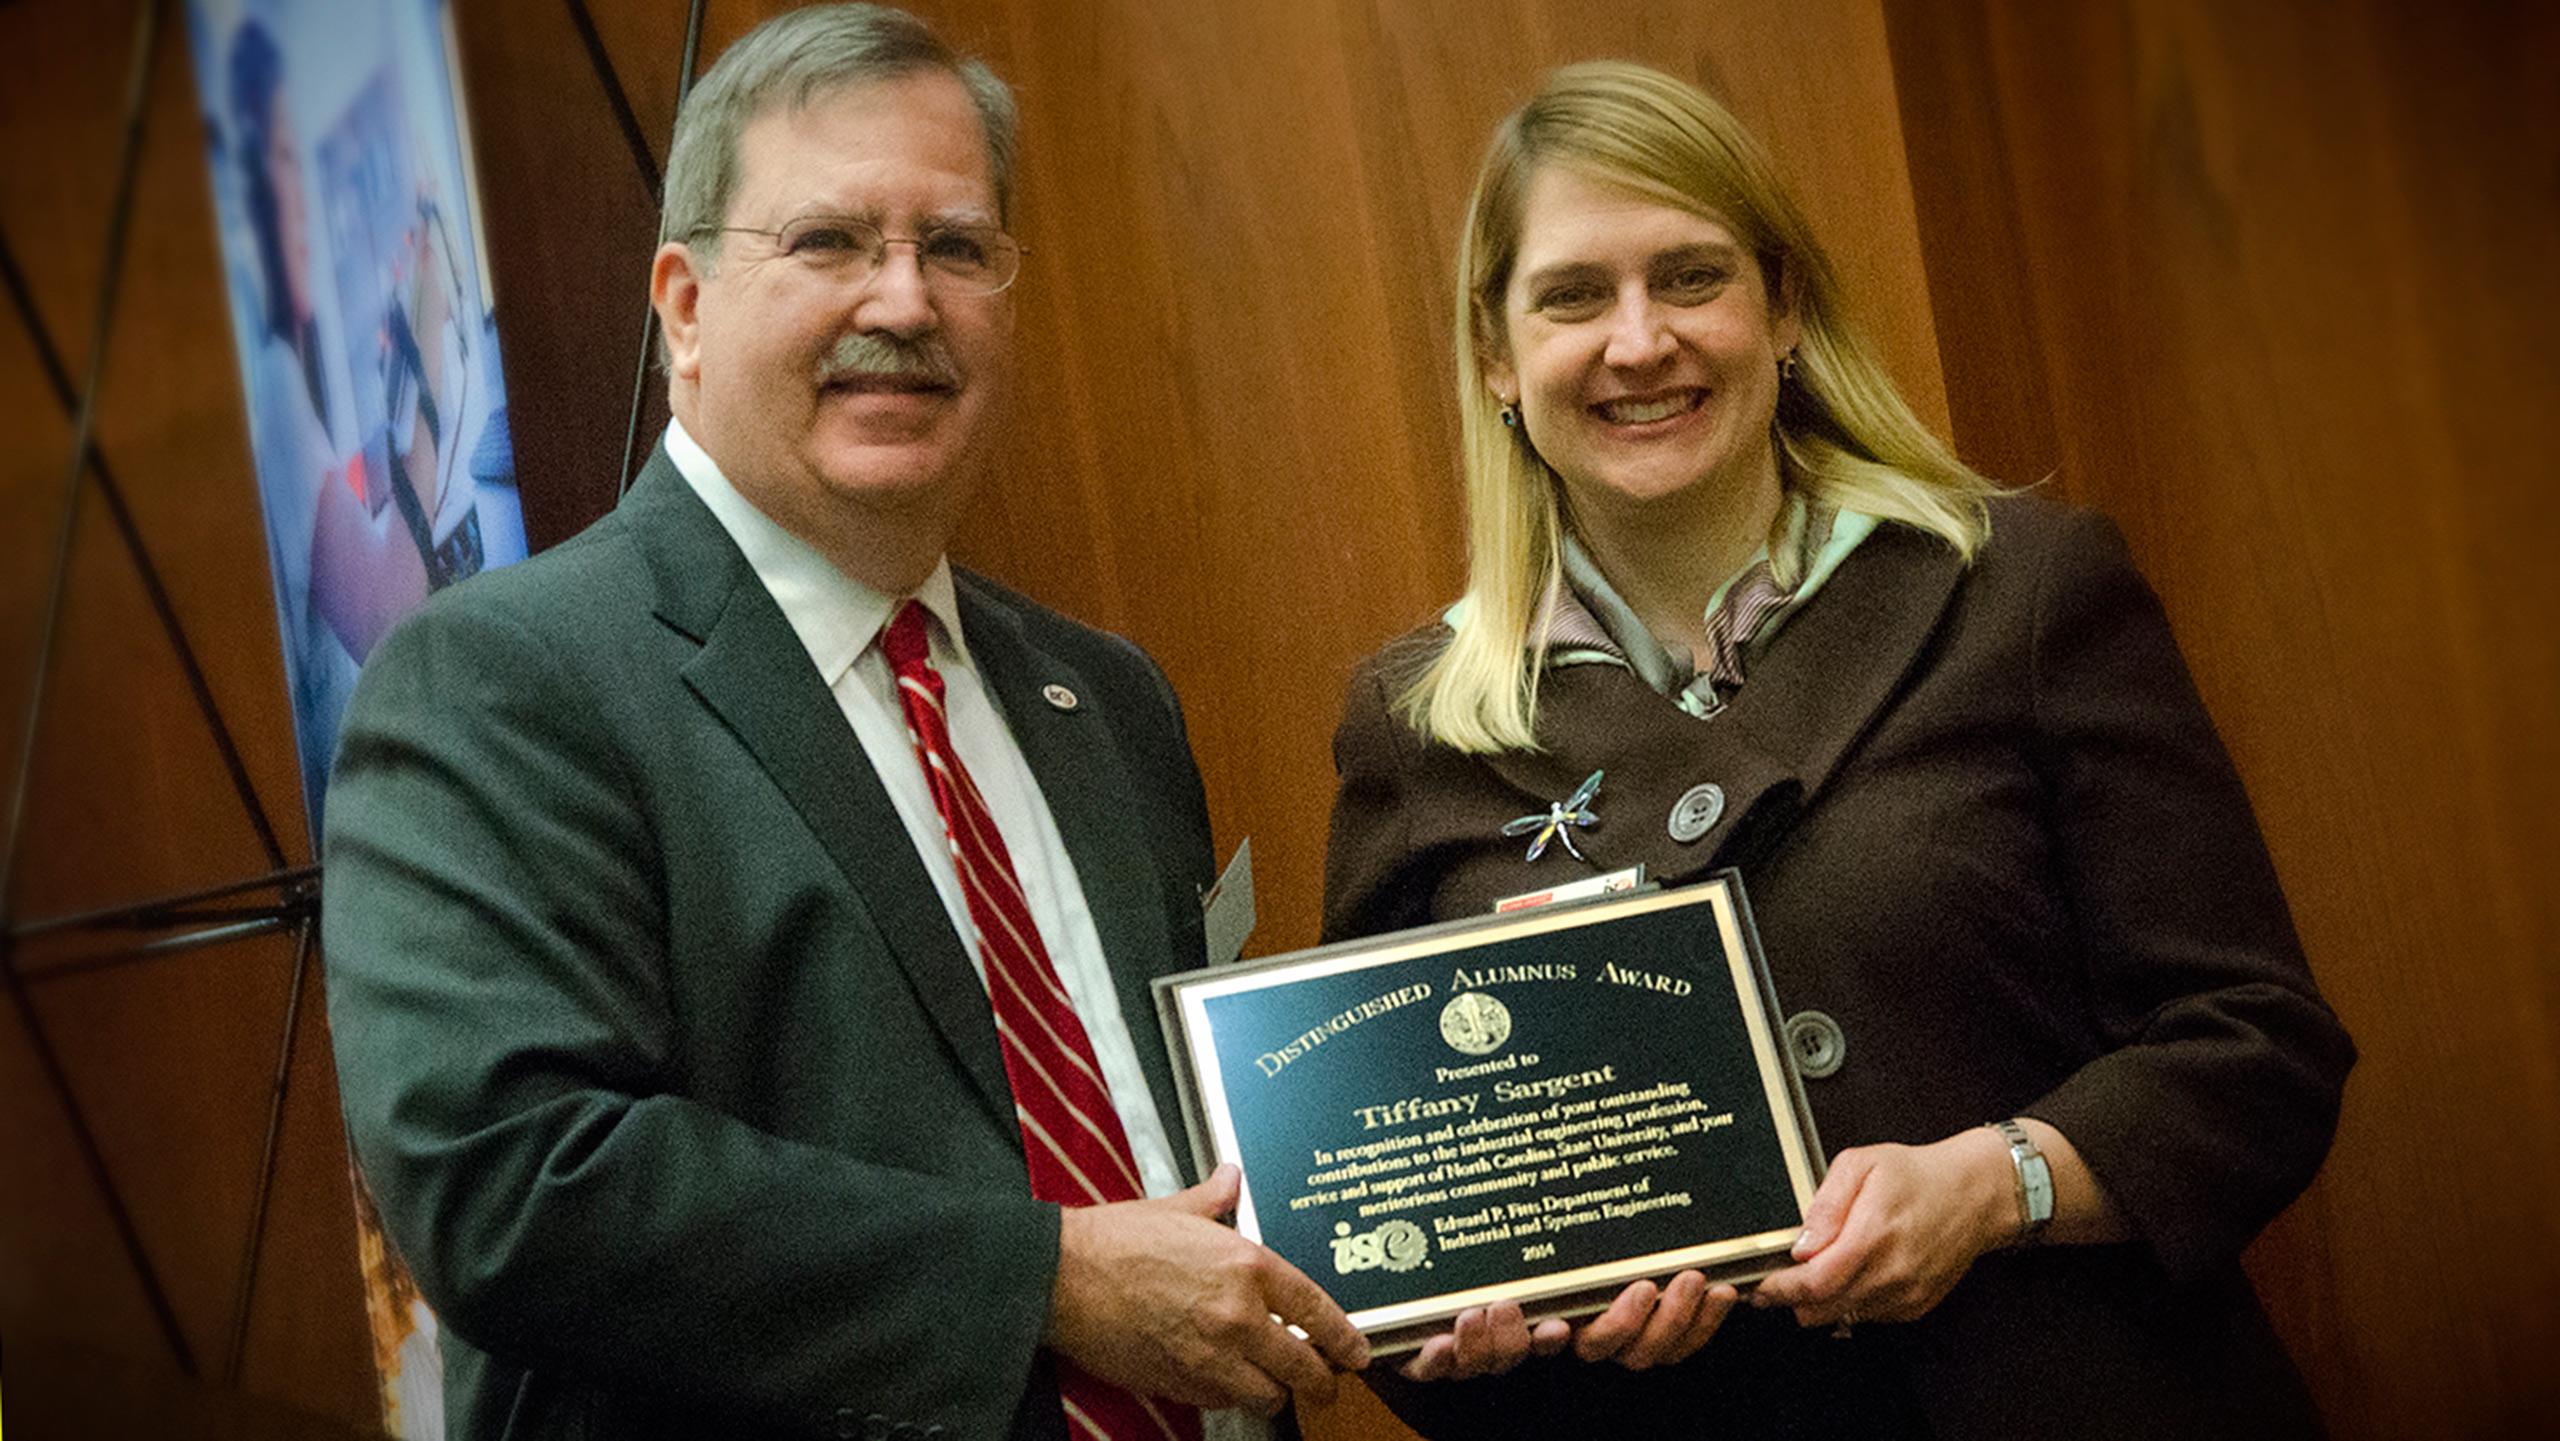 Distinguished Alumni Tiffany Sargent